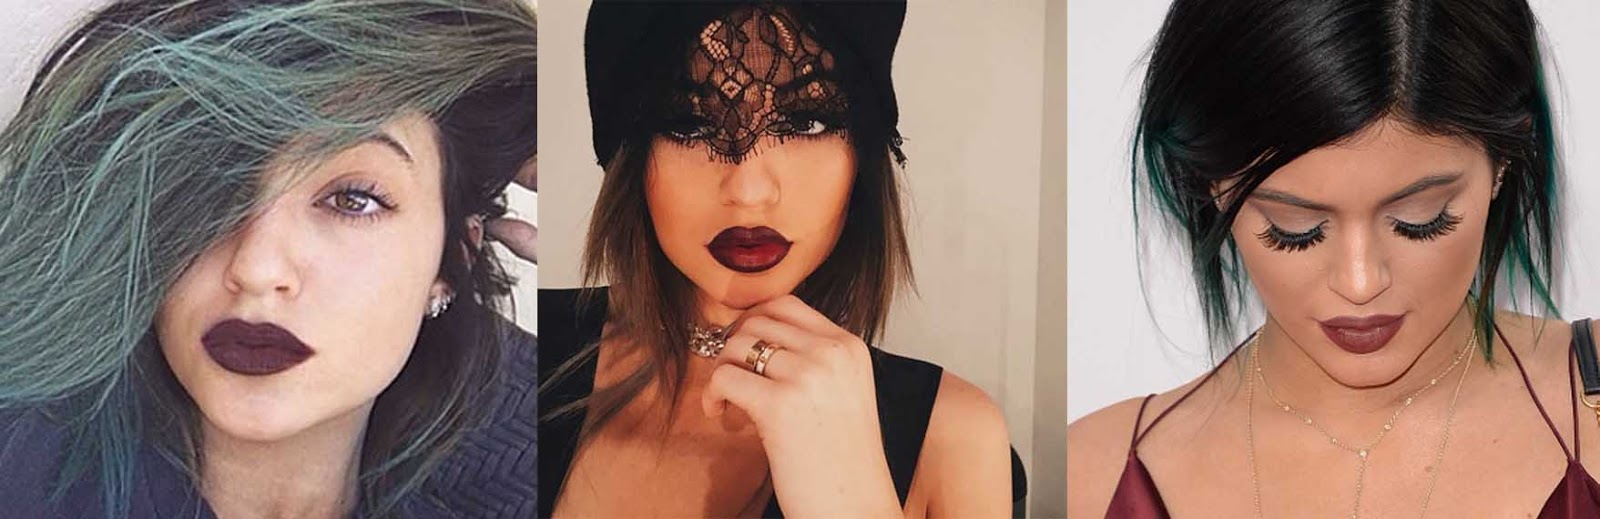 kylie jenner dark lips